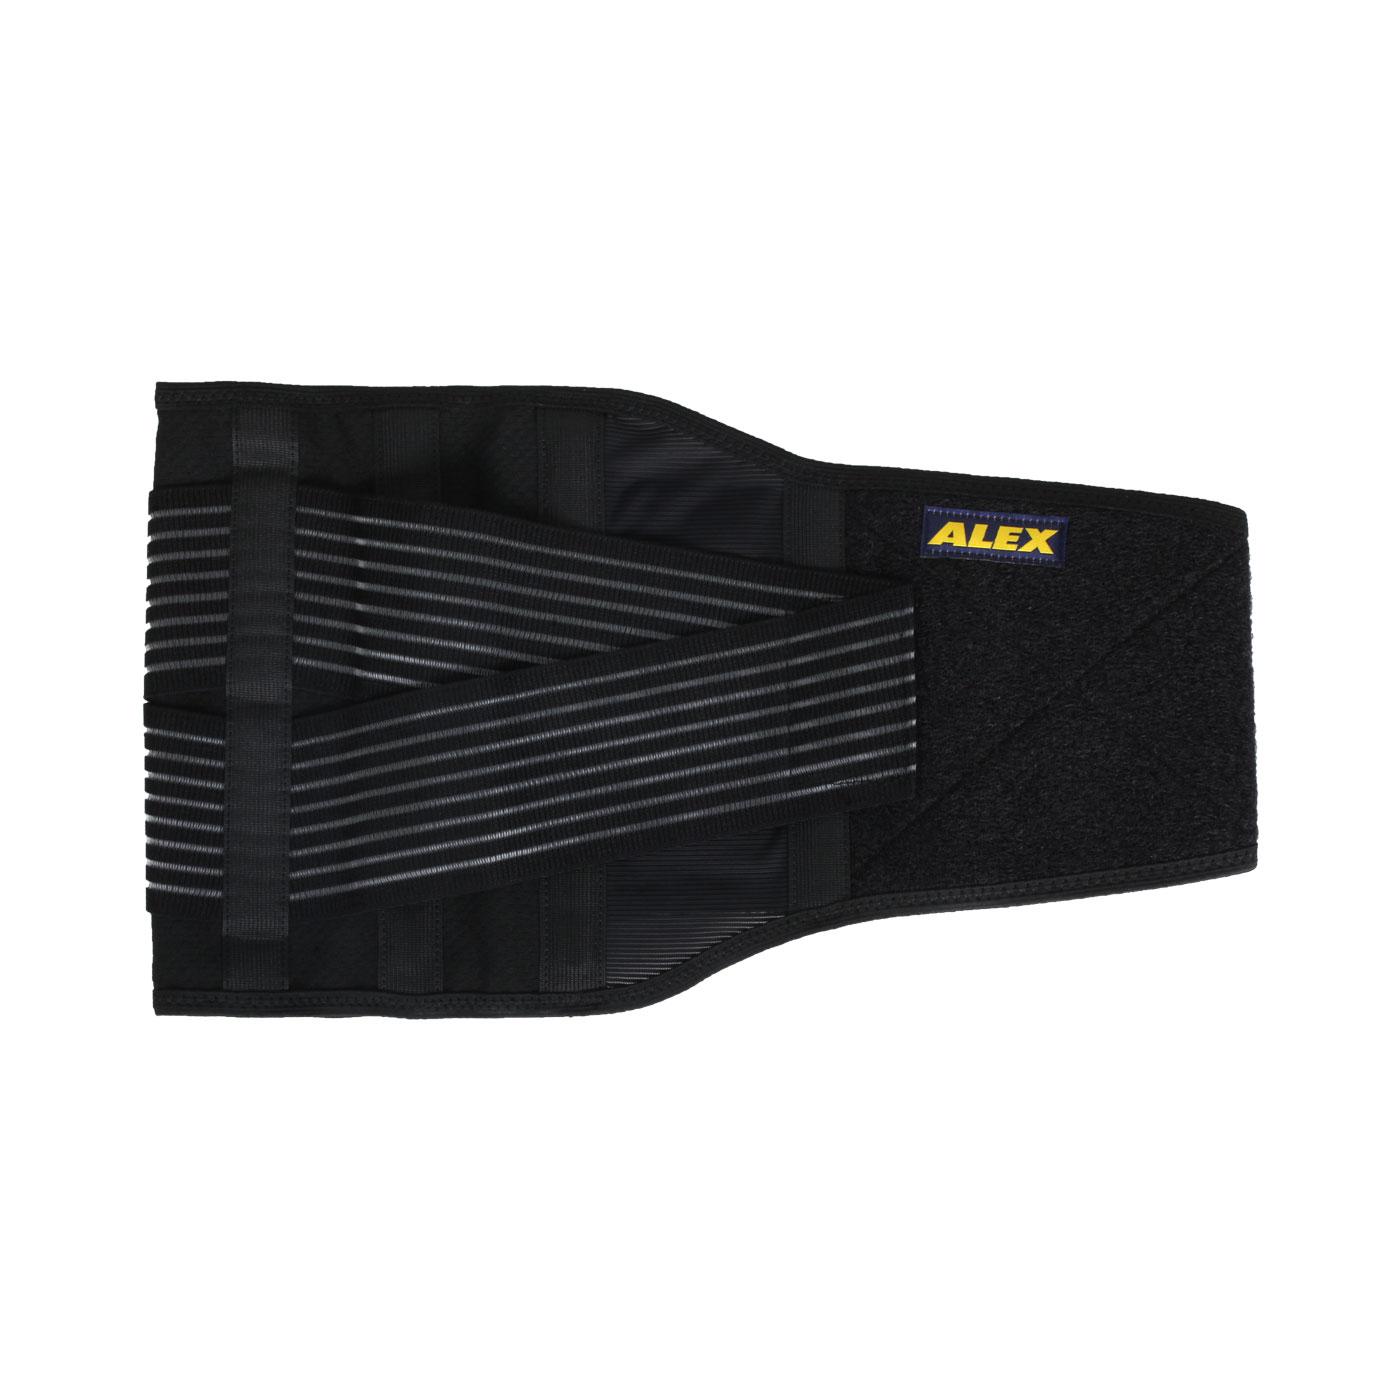 ALEX 纖薄型護腰 T-50